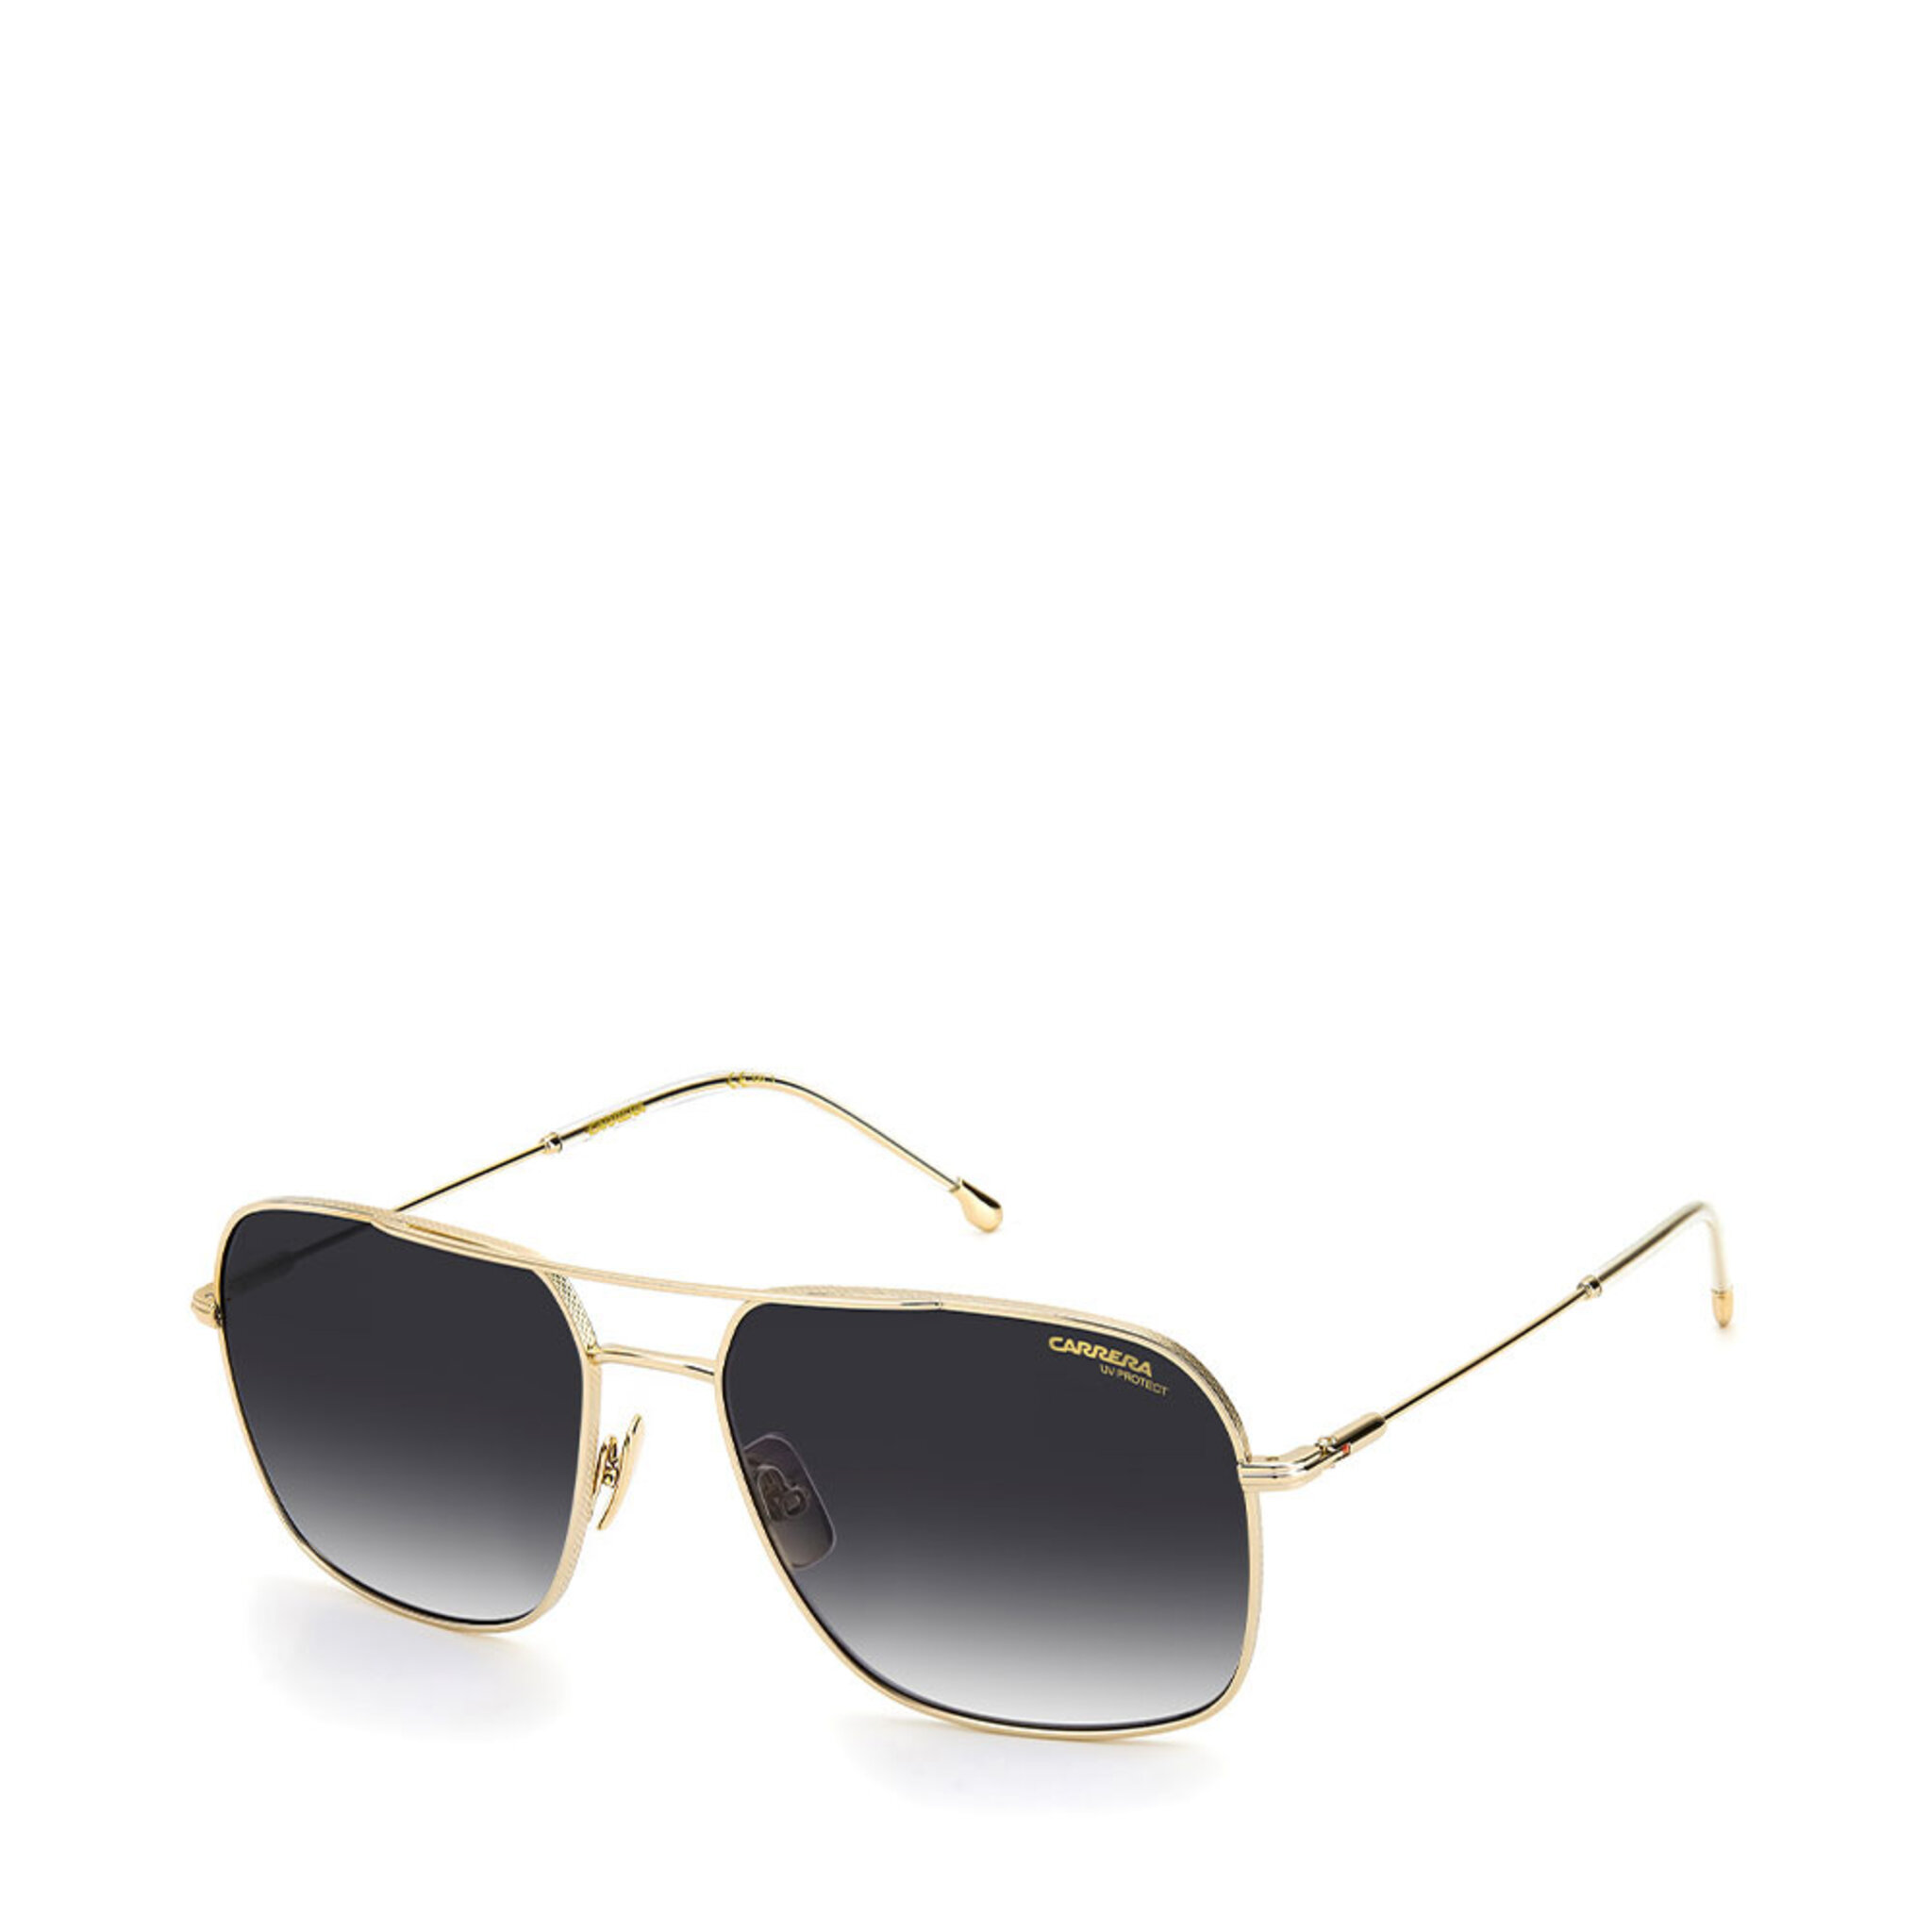 CARRERA Sunglasses CARRERA 247/S, 5817